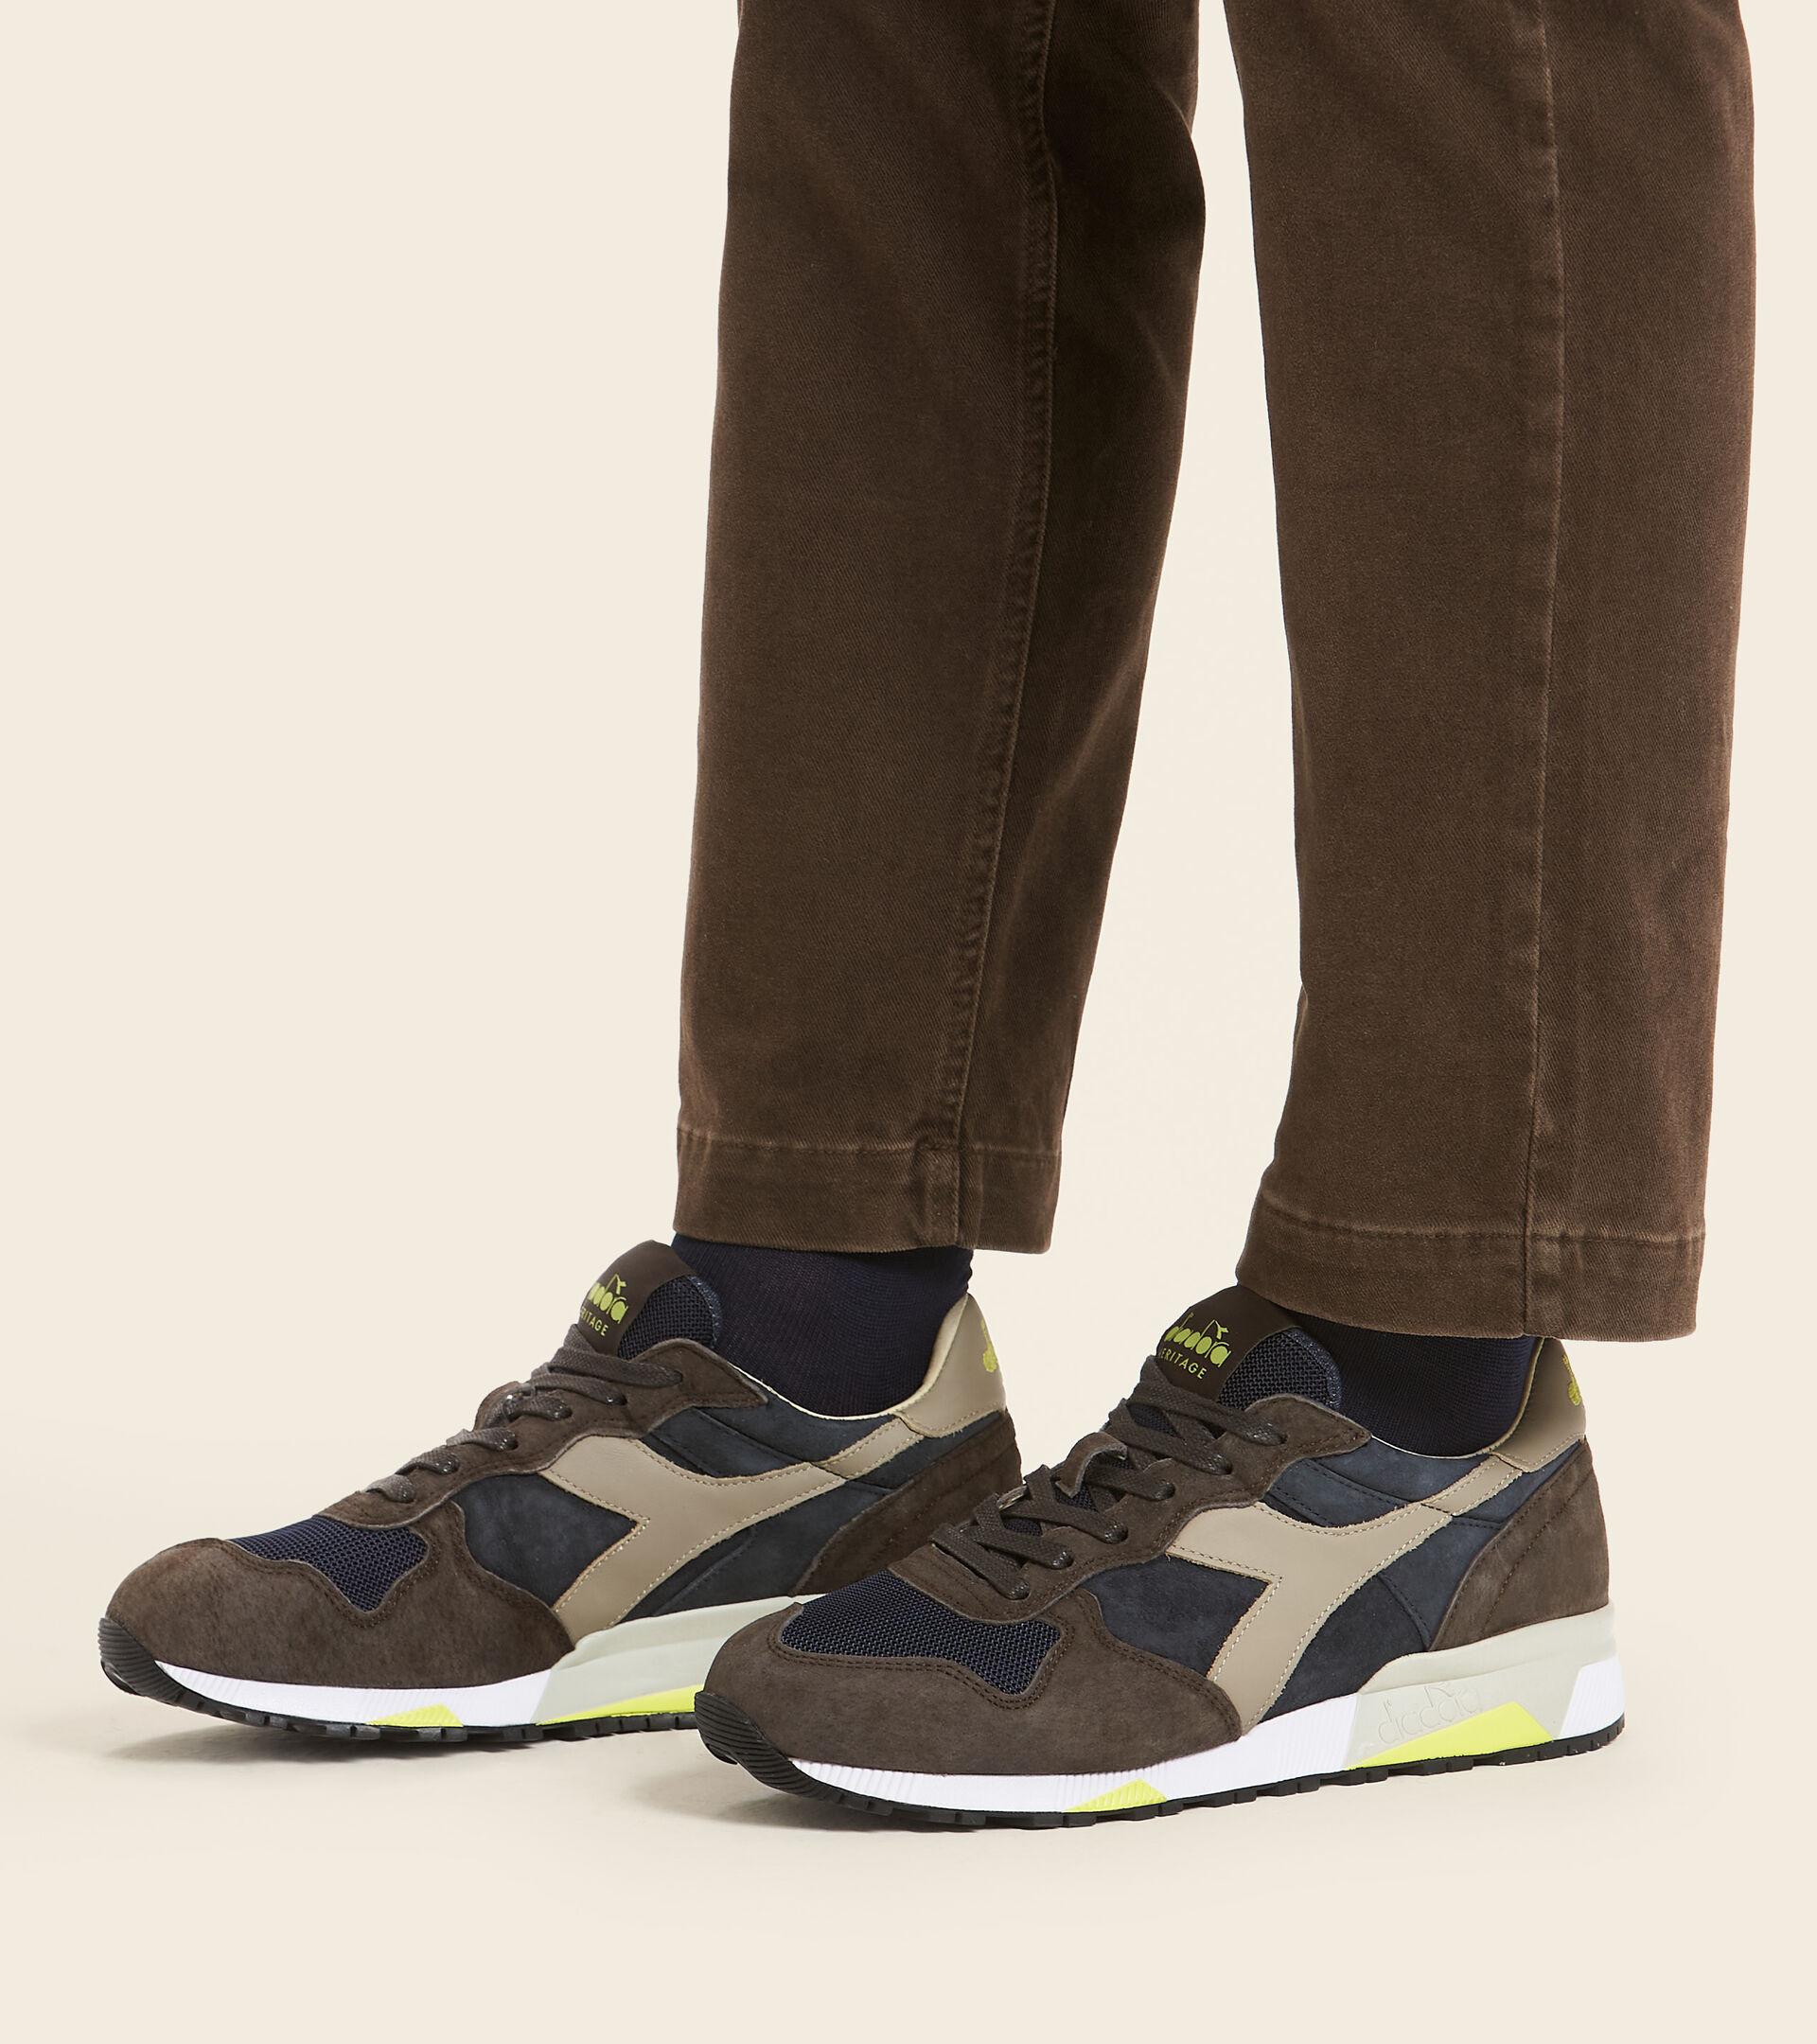 Footwear Heritage UOMO TRIDENT 90 SUEDE SW BLU PROFONDO/MARRONE CAFFE TUR Diadora